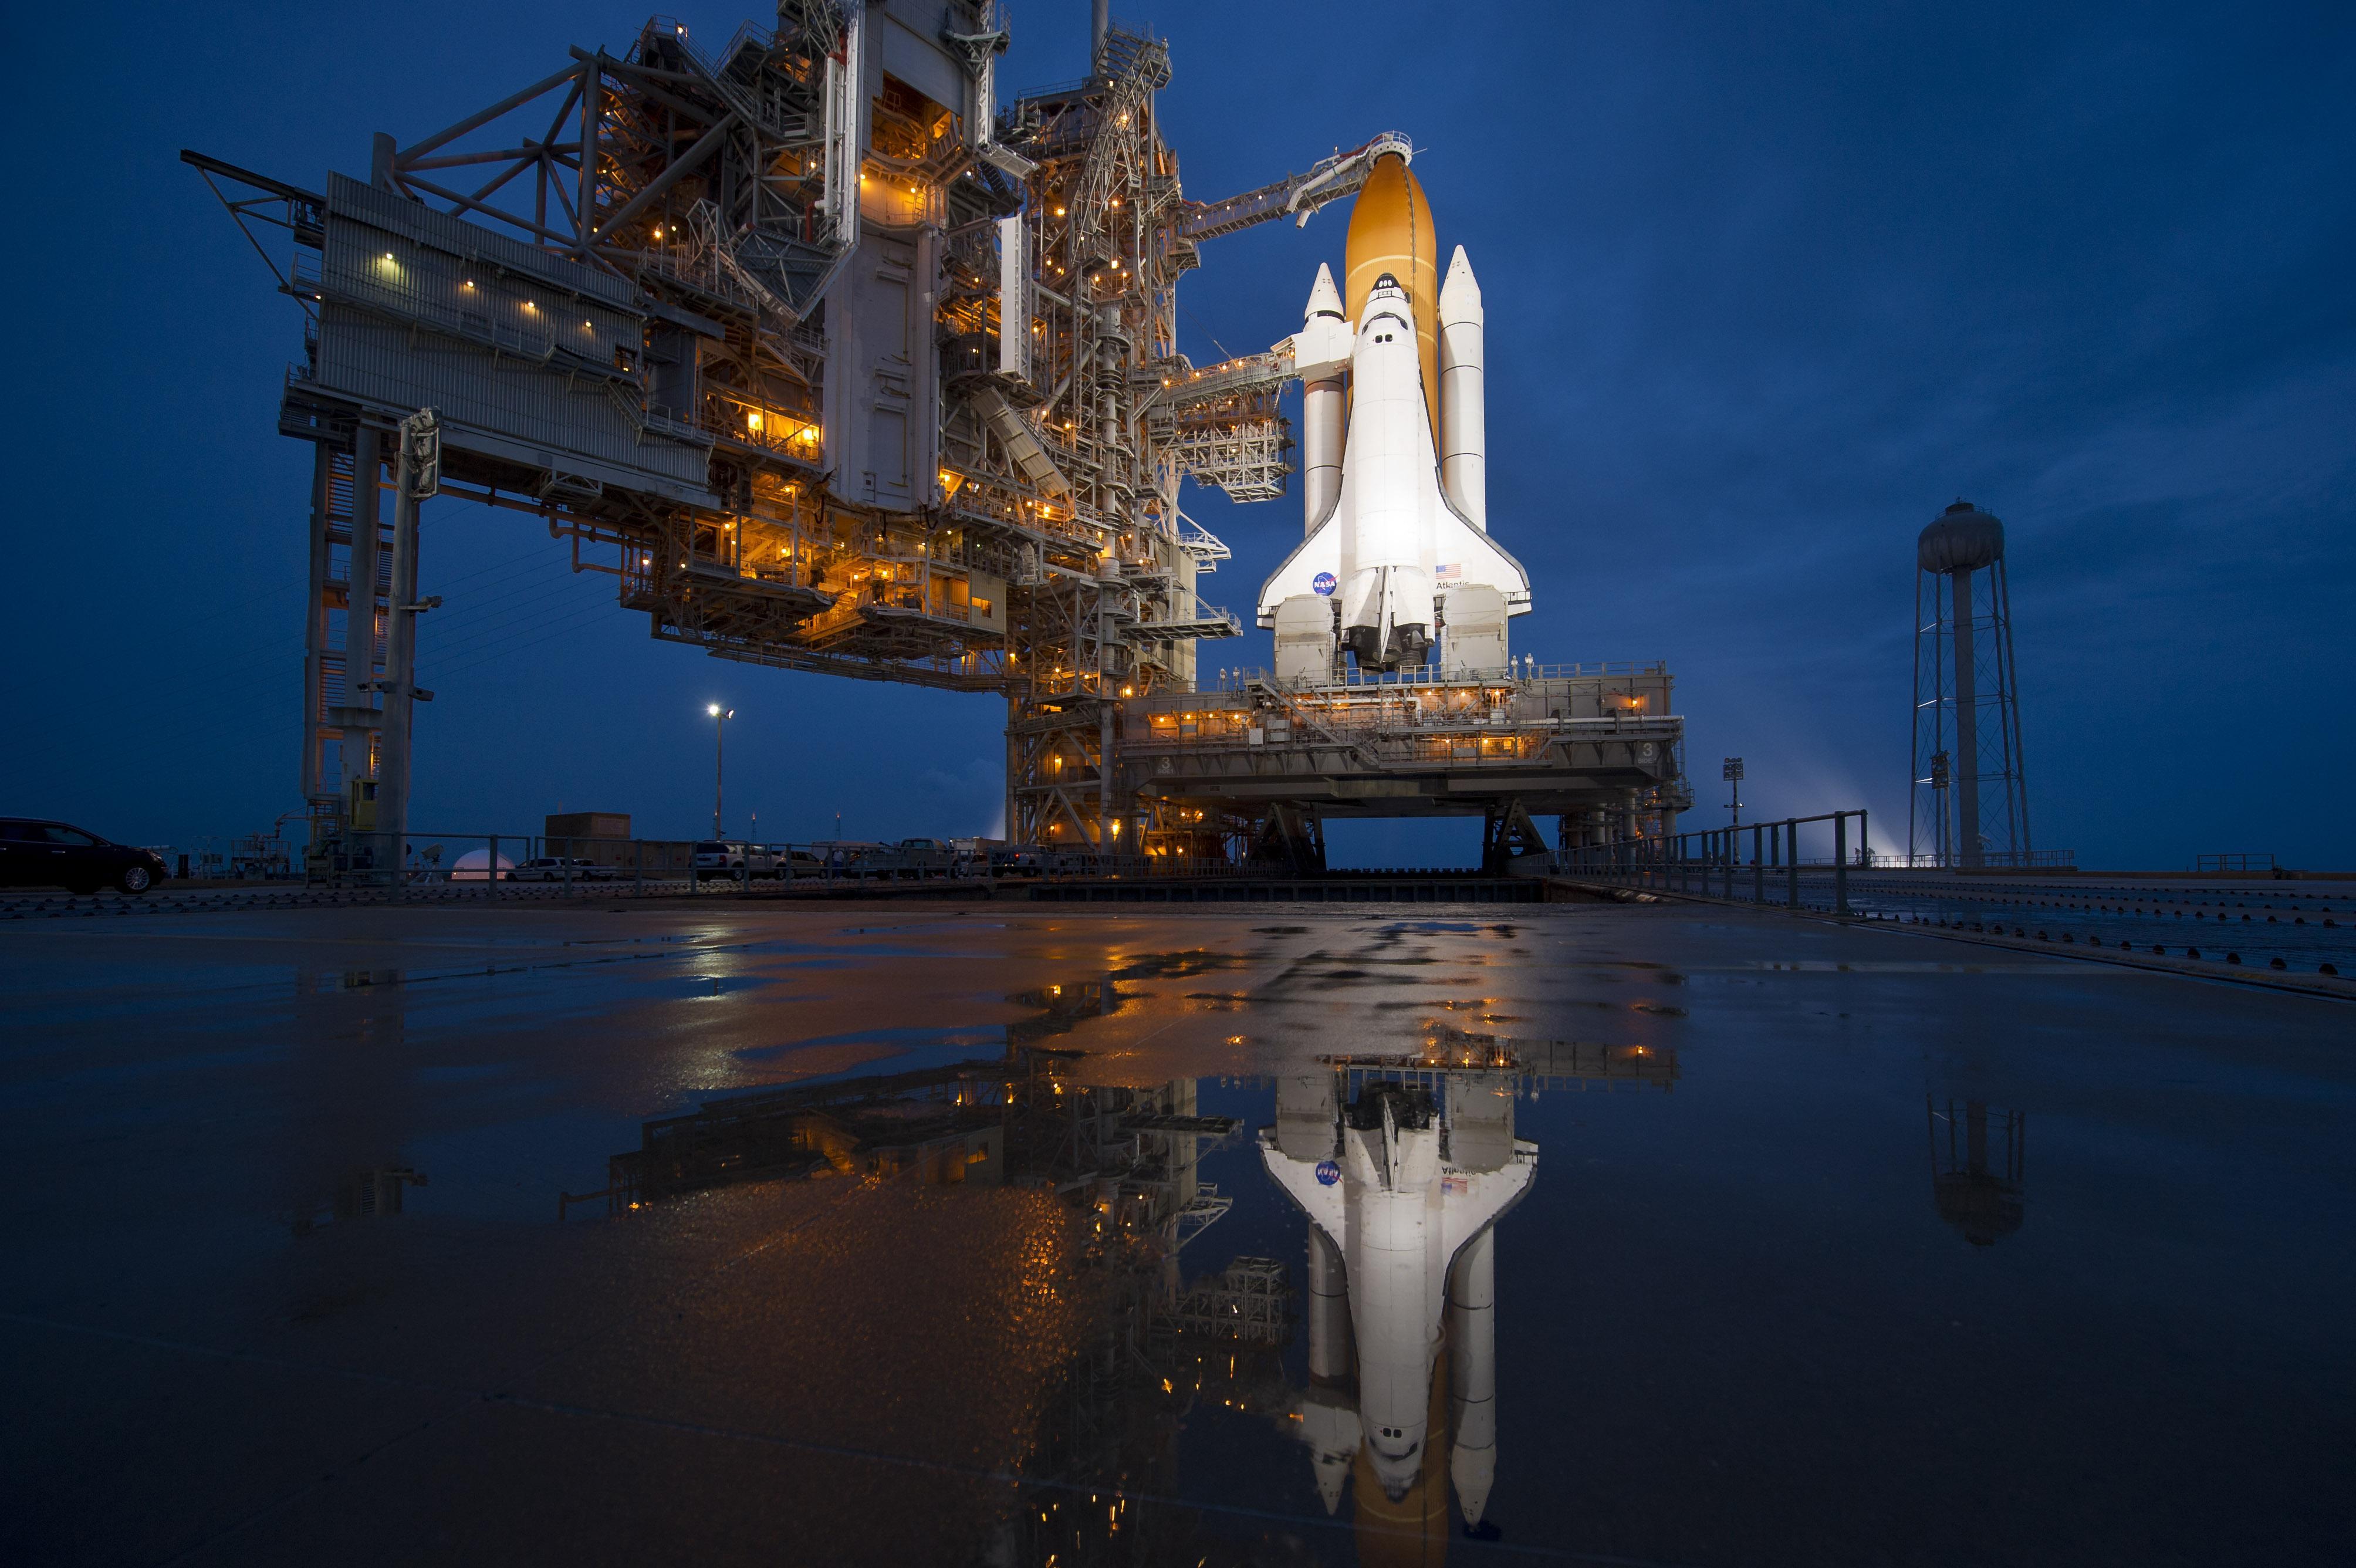 Shuttle Atlantis Shuttle Atlantis at Launch Pad